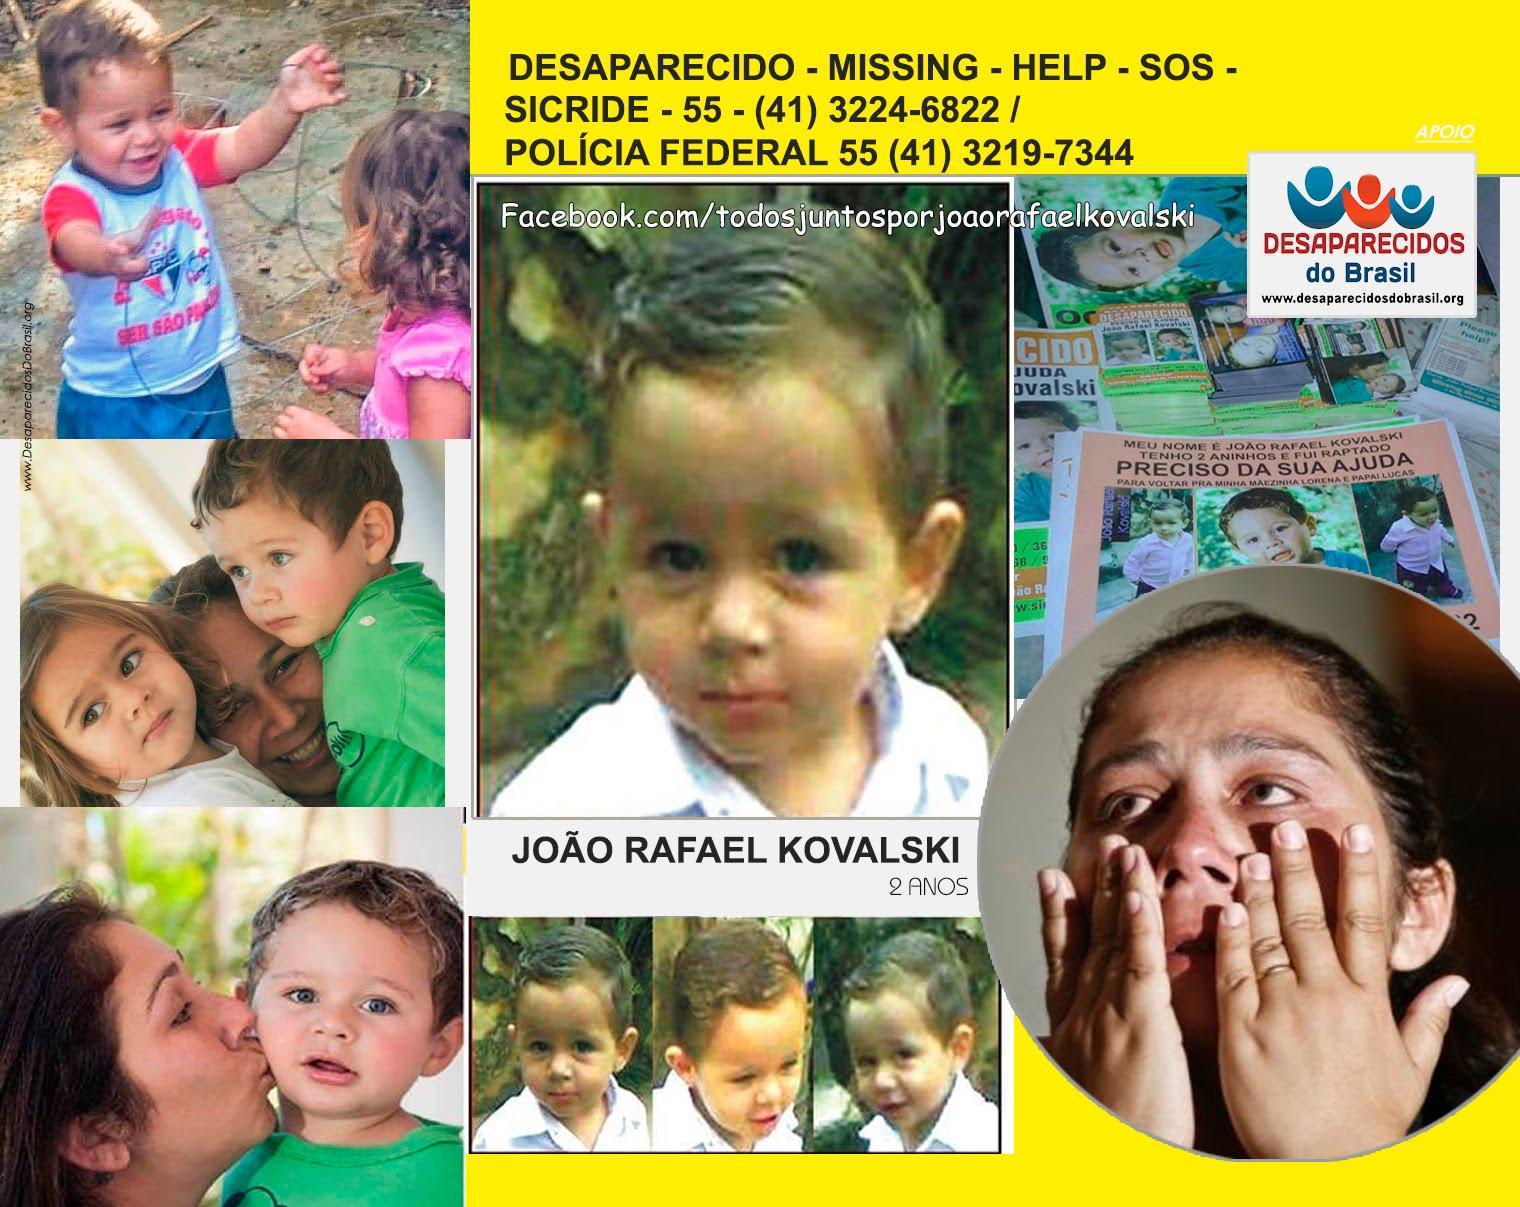 https://sites.google.com/a/desaparecidosdobrasil.org/desaparecidos-do-brasil/criancas-desaparecidas/parana/joaorafaelsantoskovalski/Jo%C3%A3o%20Rafael%20Kovalski%20%20crian%C3%A7a%20desaparecida.jpg